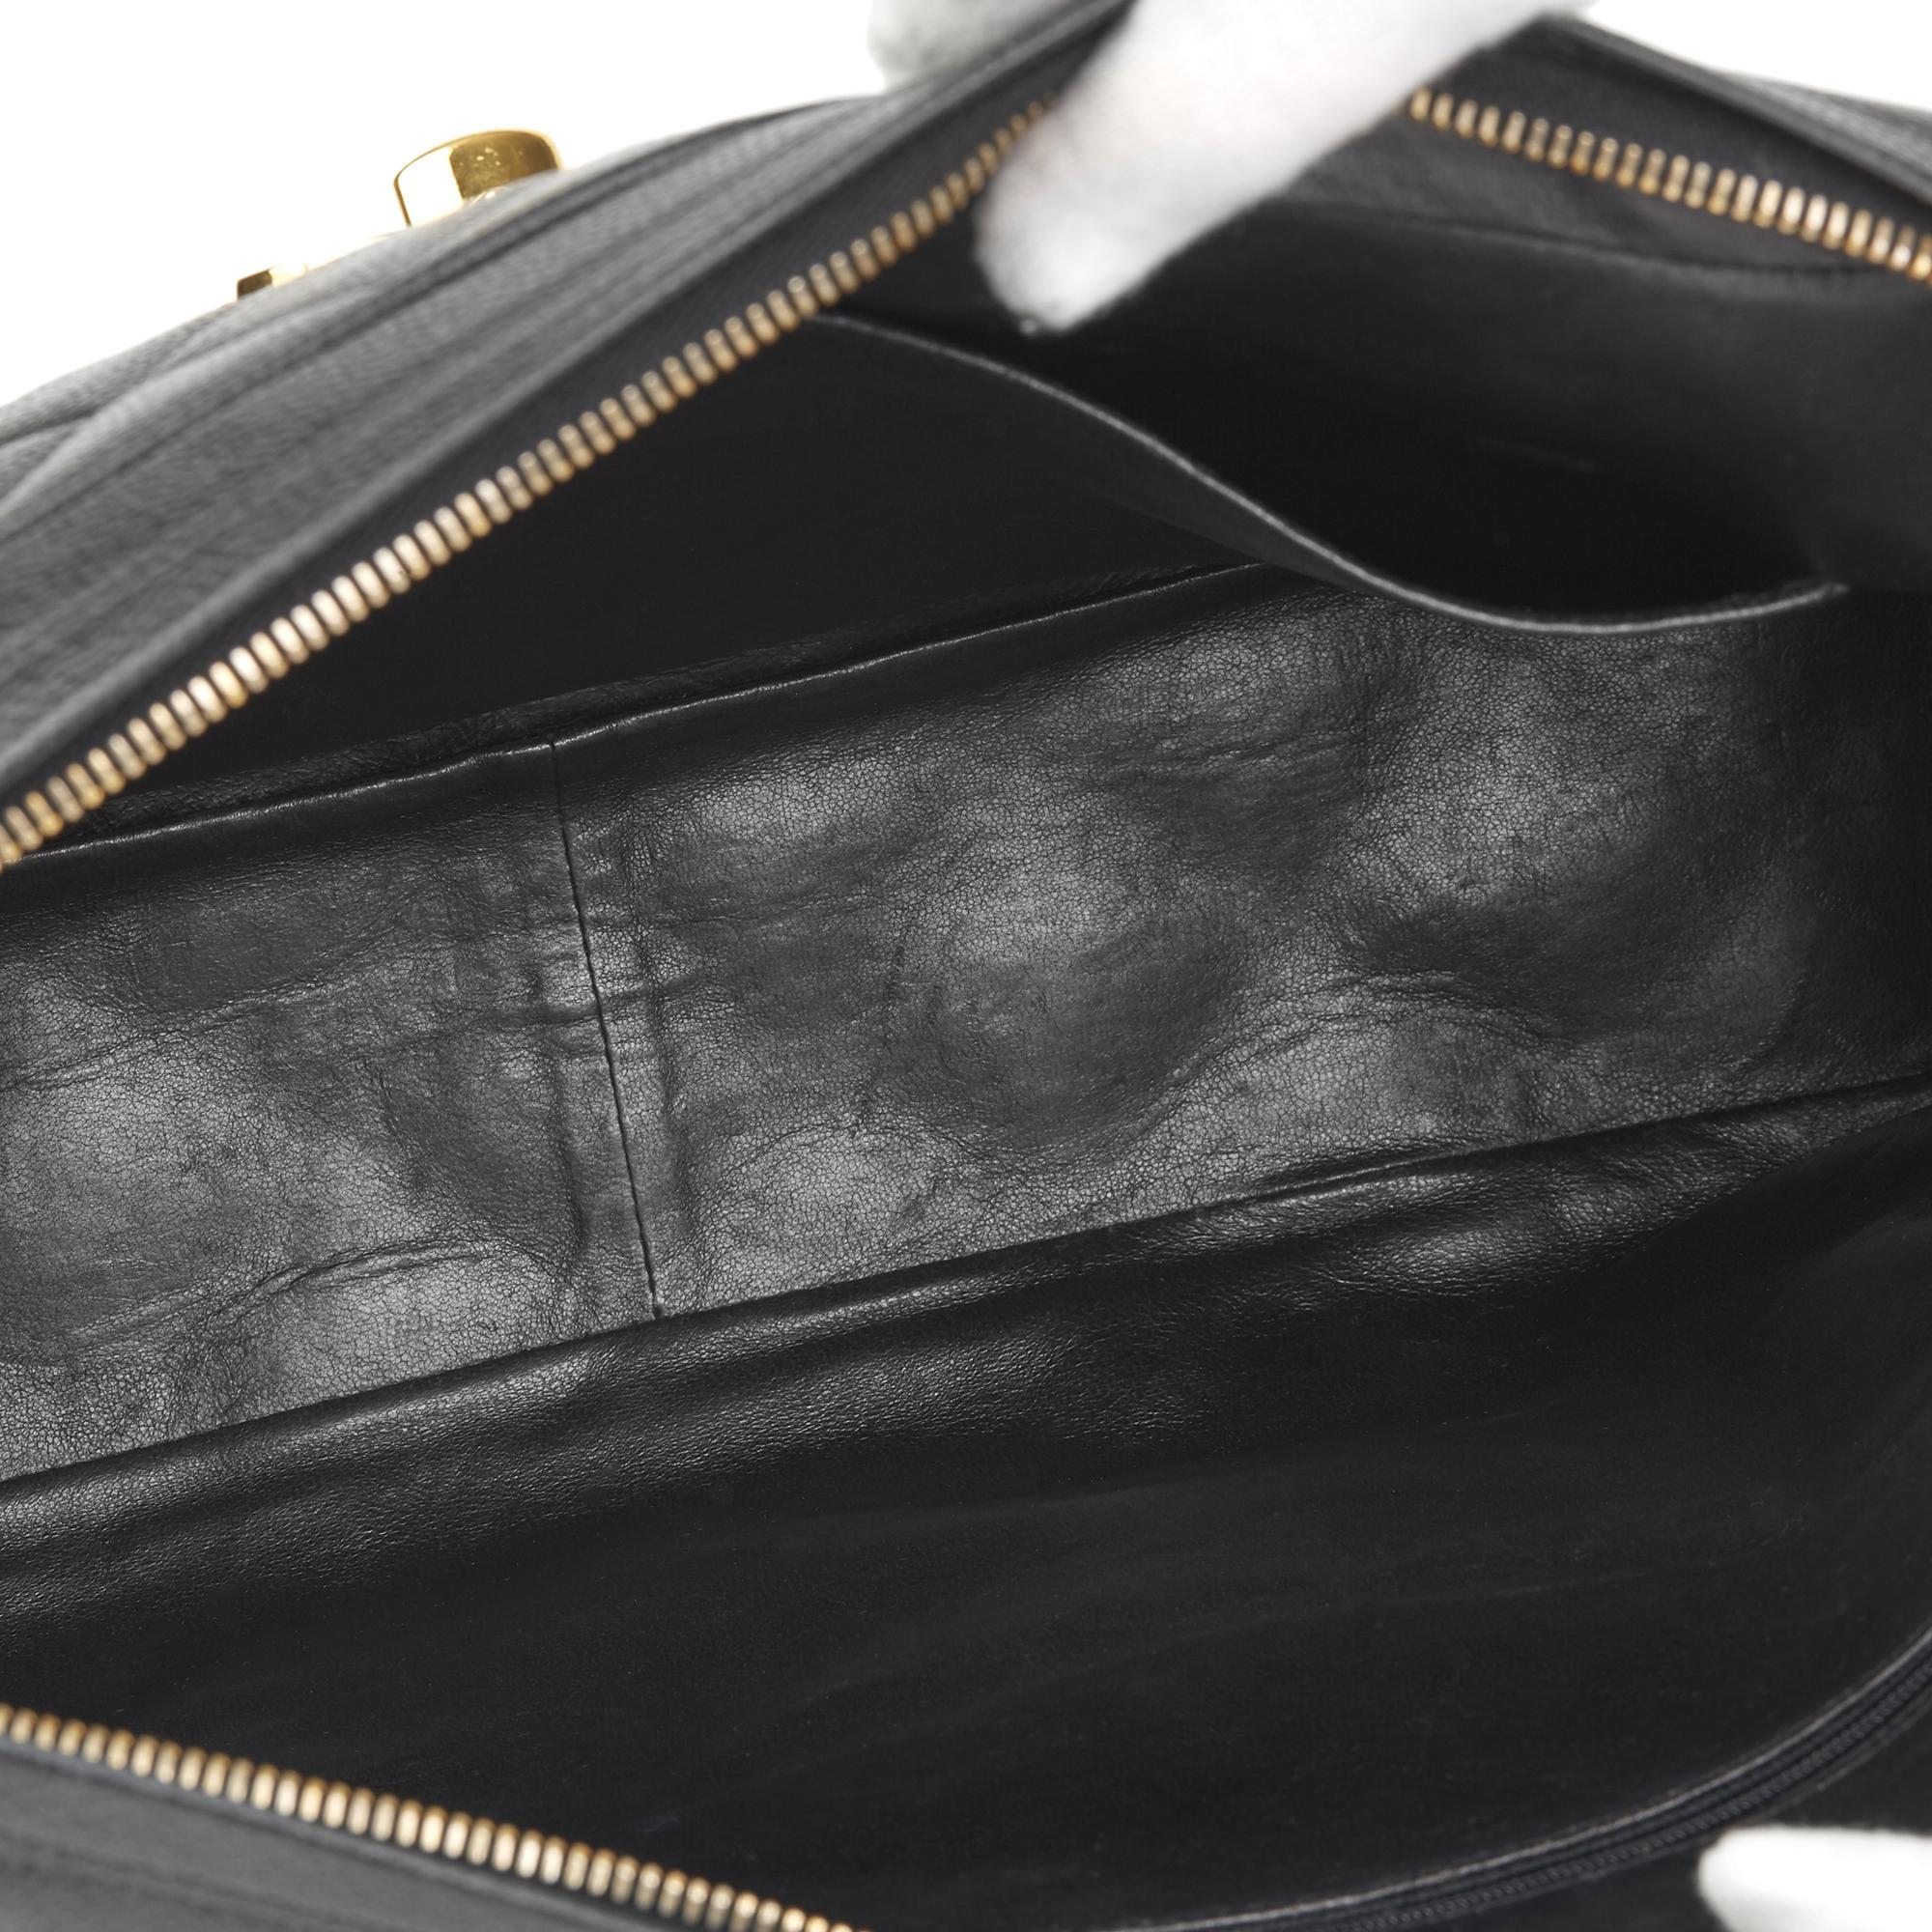 0c0f017da26d94 Chanel. Women's Black Quilted Caviar Leather Vintage Maxi Jumbo Xl Camera  Bag